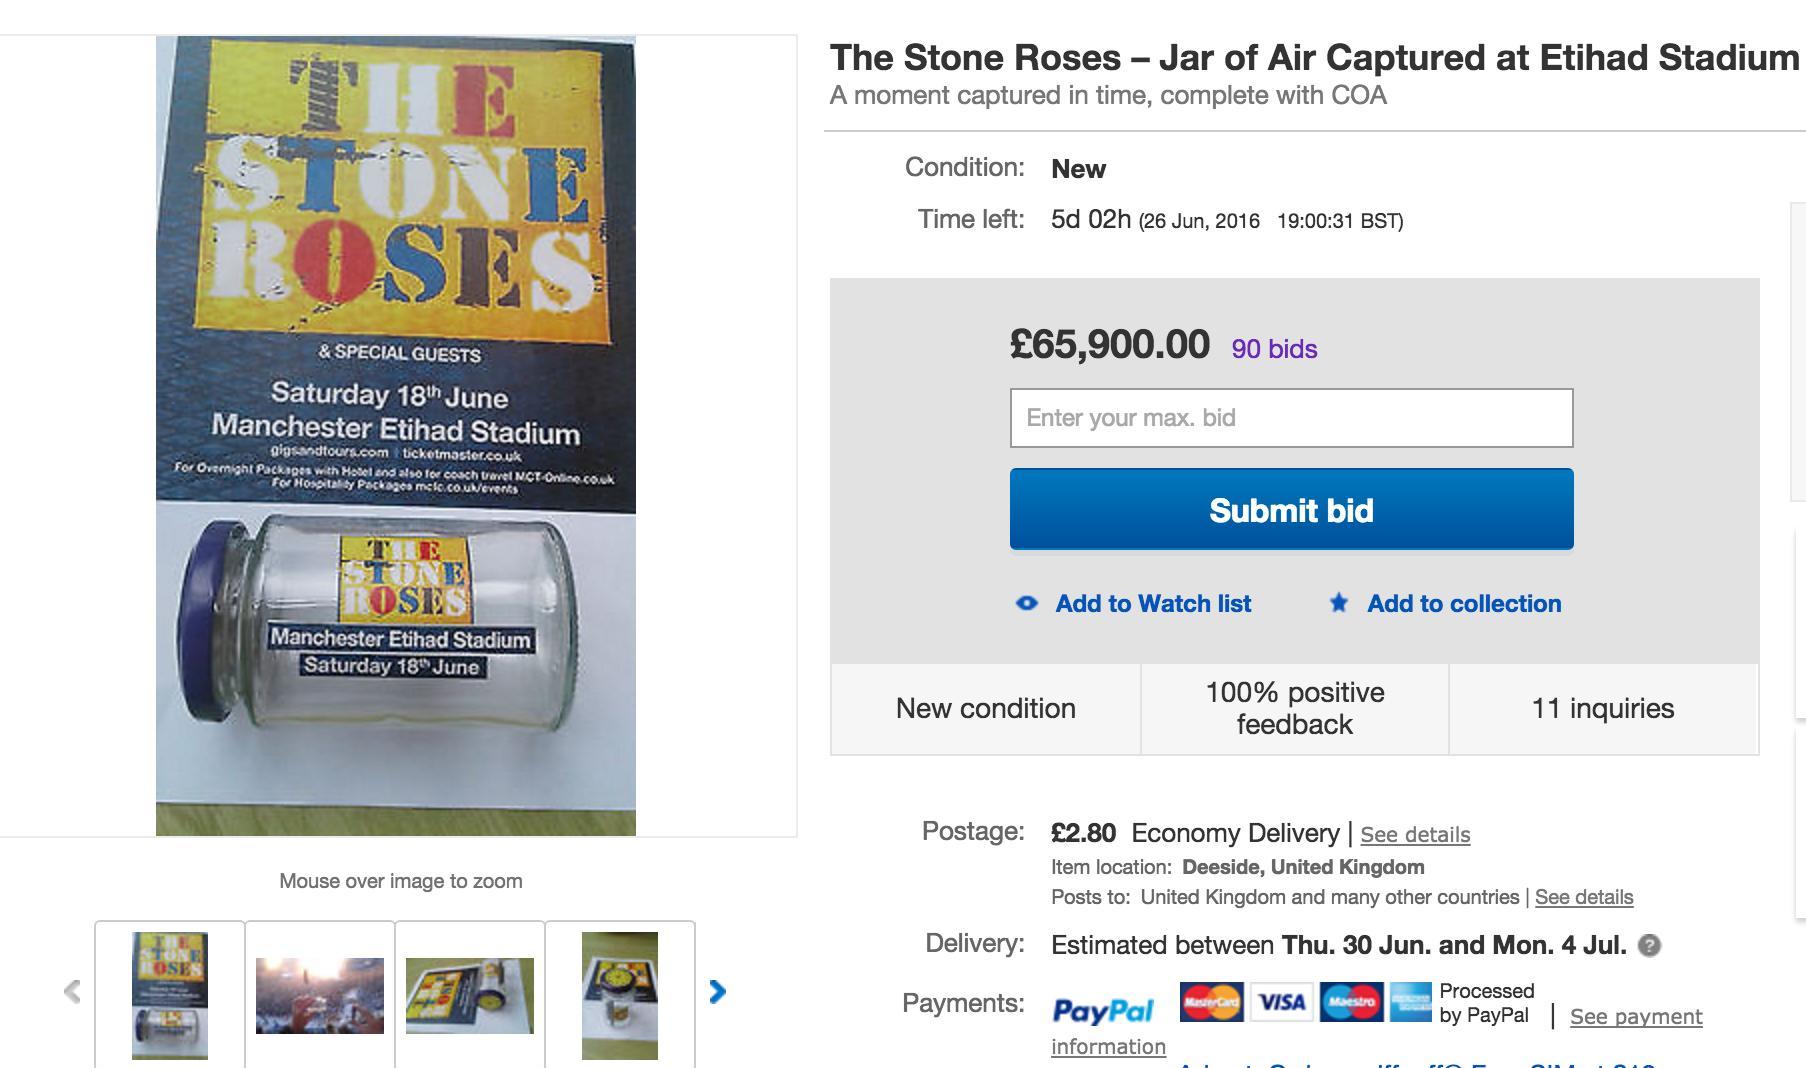 The Stone Roses Jar on Ebay